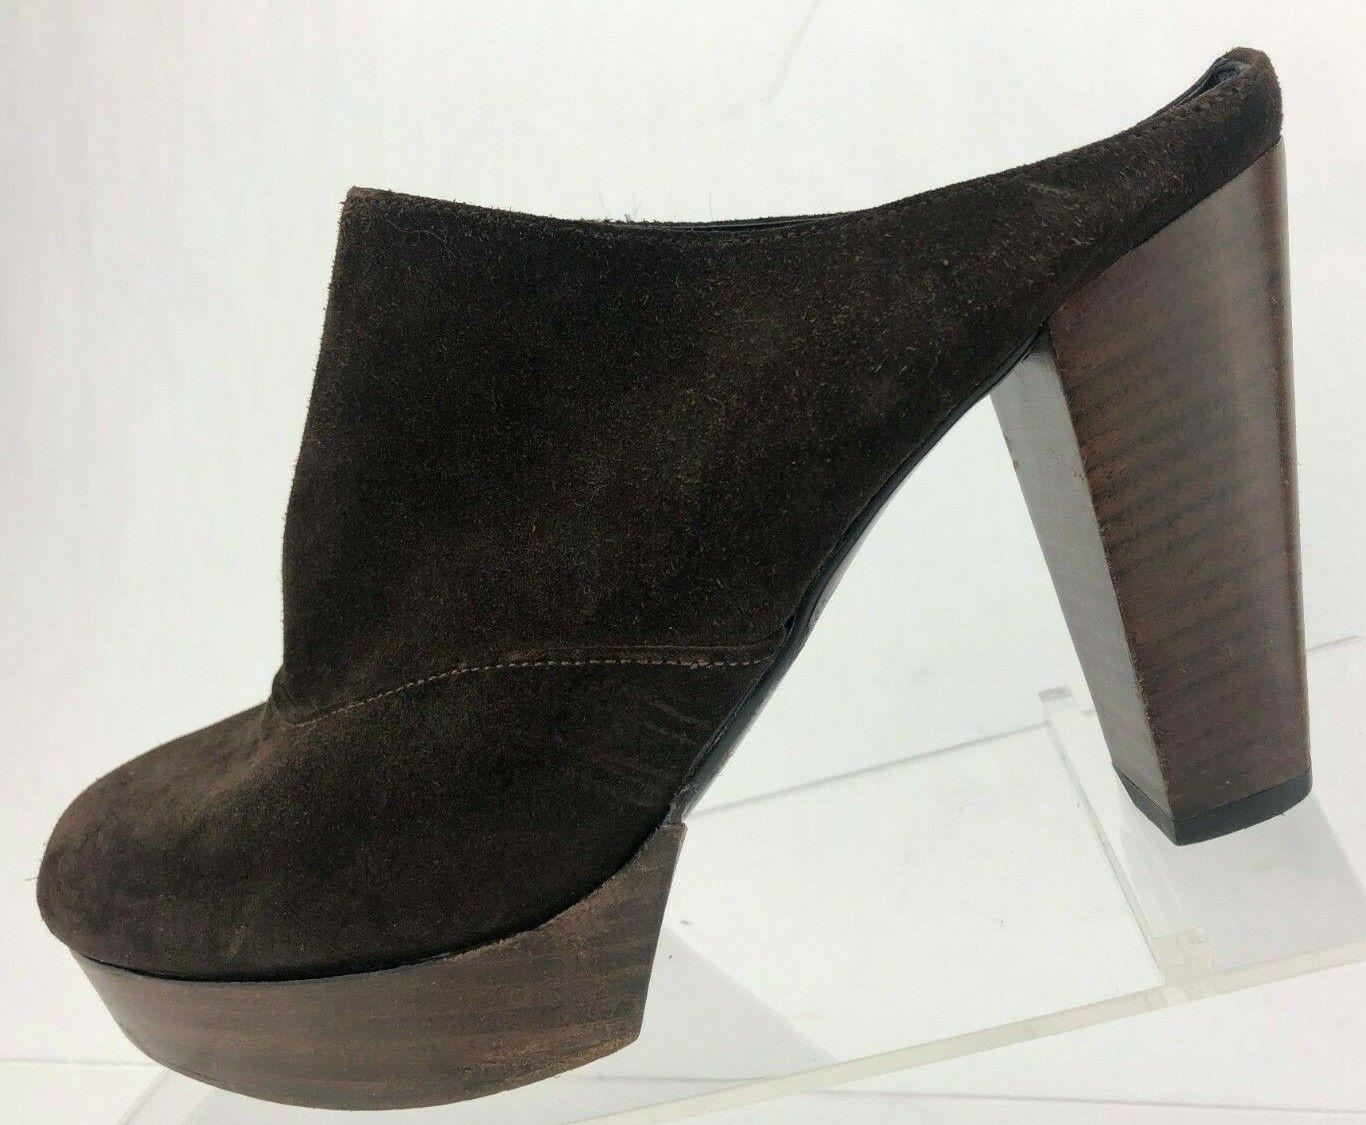 vendite dirette della fabbrica Robert Clergerie Mules Heels Closed Toe Toe Toe Marrone Suede Slides Platform donna 6.5 B  grande sconto